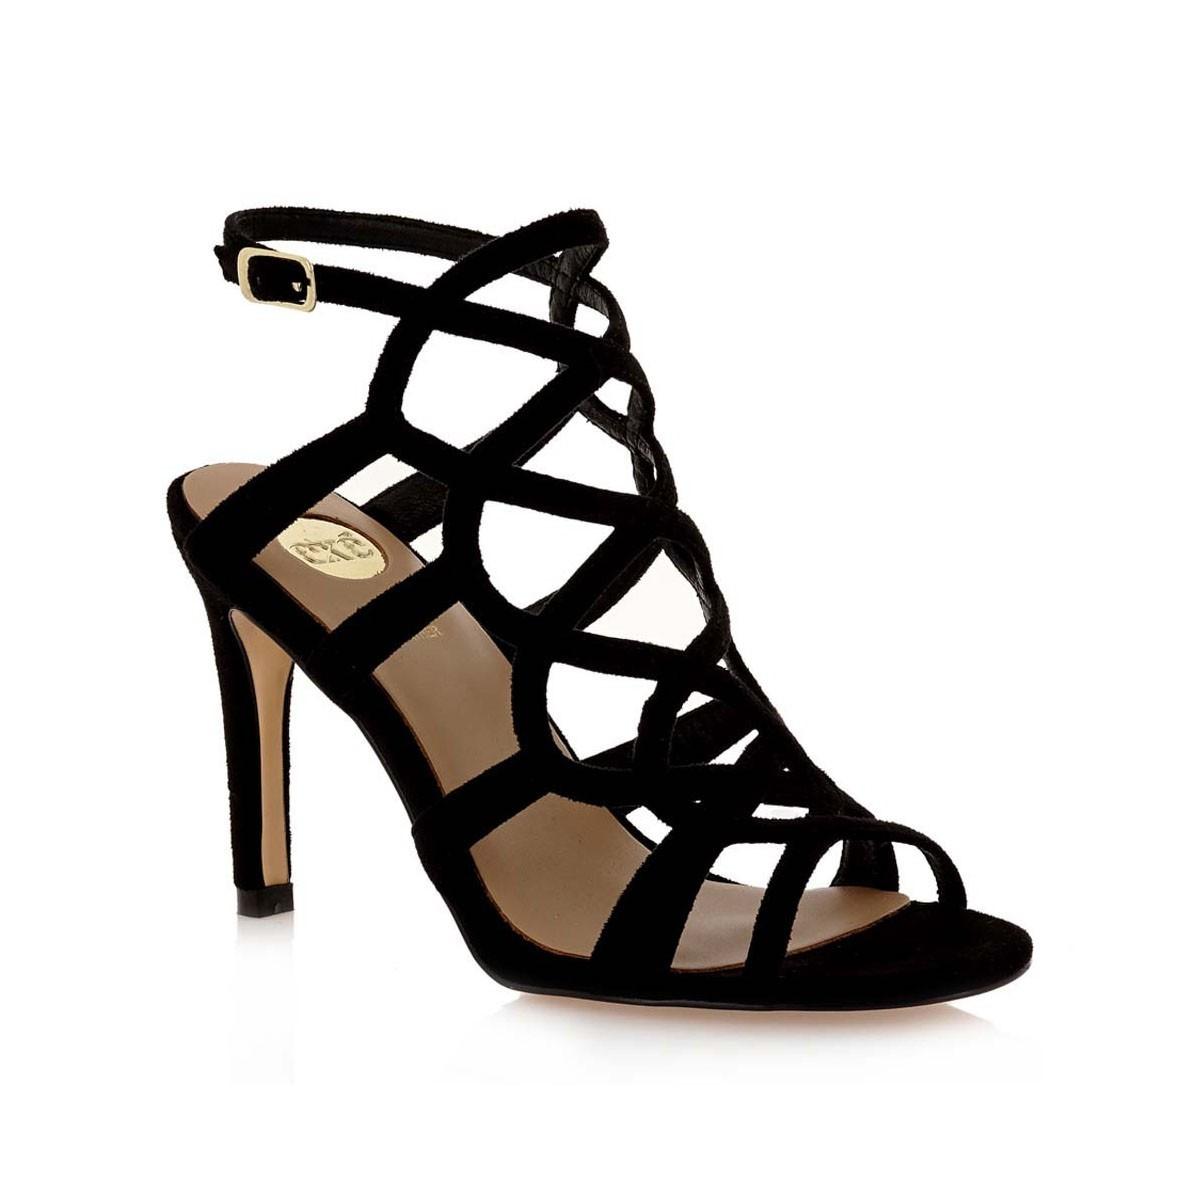 4103d98323c EXE Shoes Πέδιλα Γυναικεία REBECA-738 Μαύρο G47007385004 |Γυναικεία ...